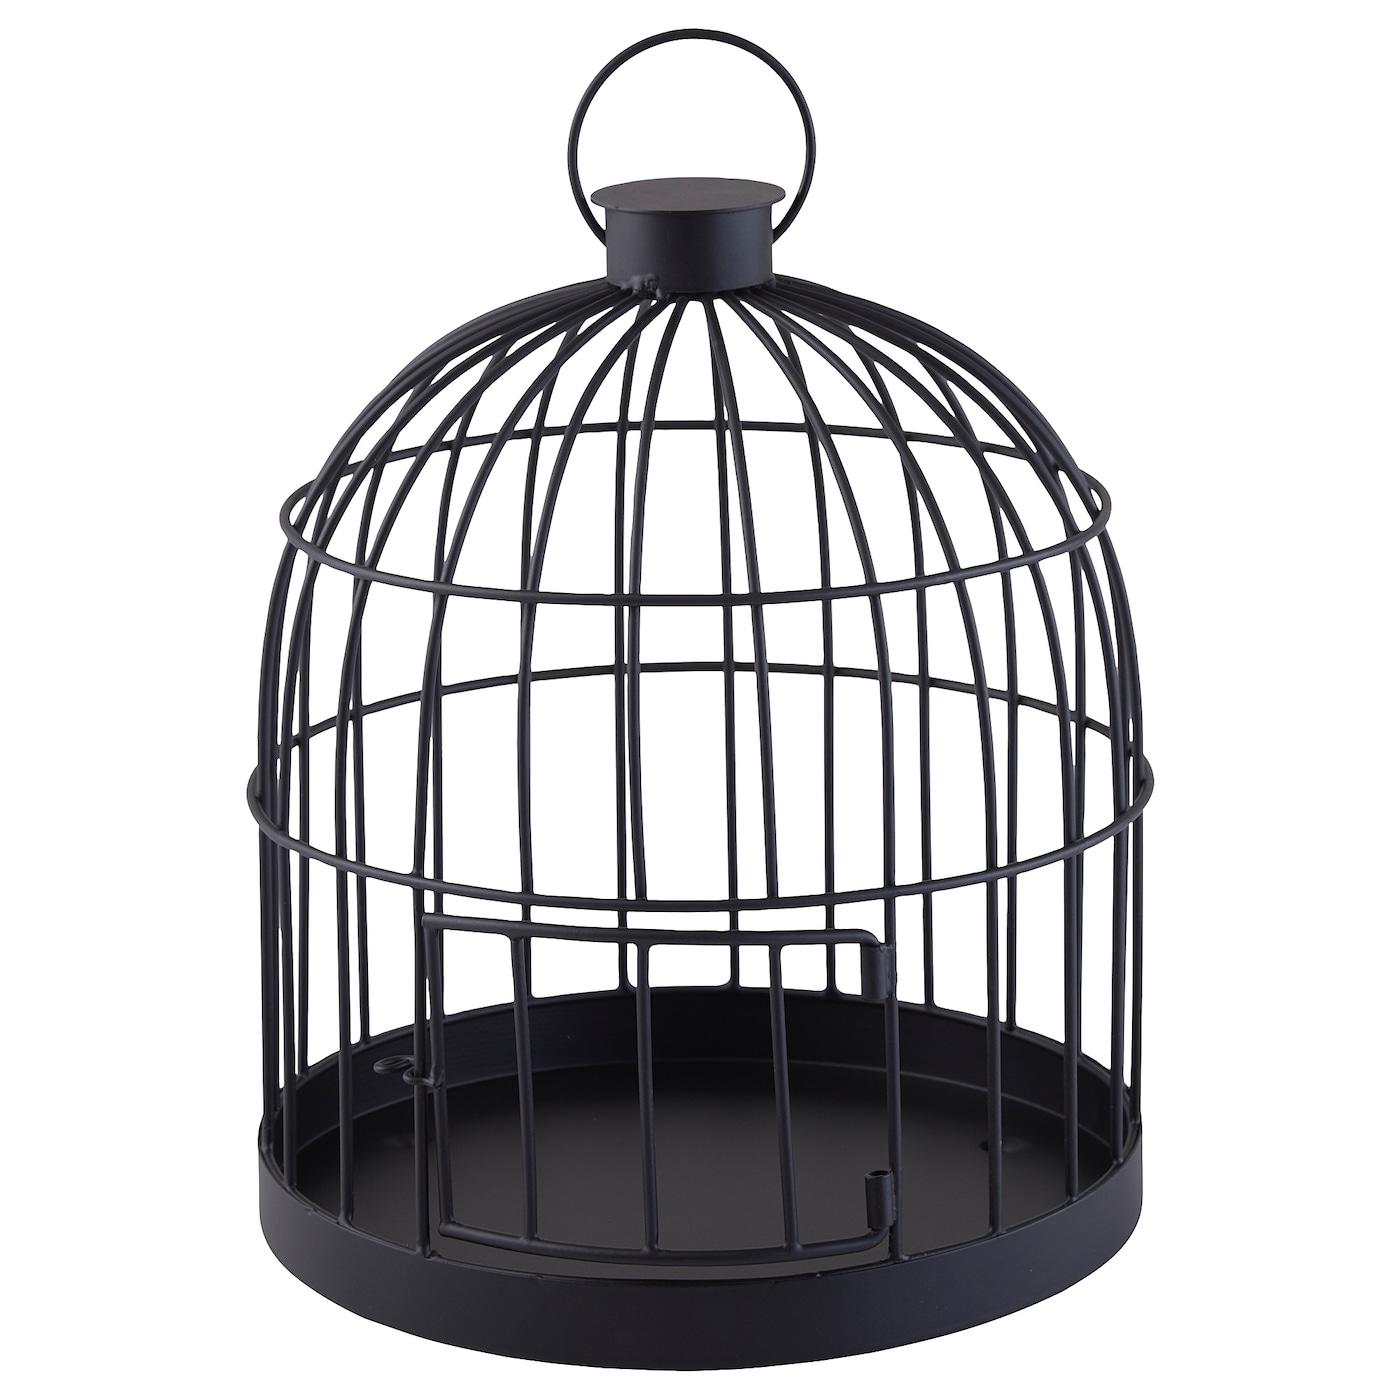 Lindrande Decoration Cage Black Length 8 190 Quot Ikea